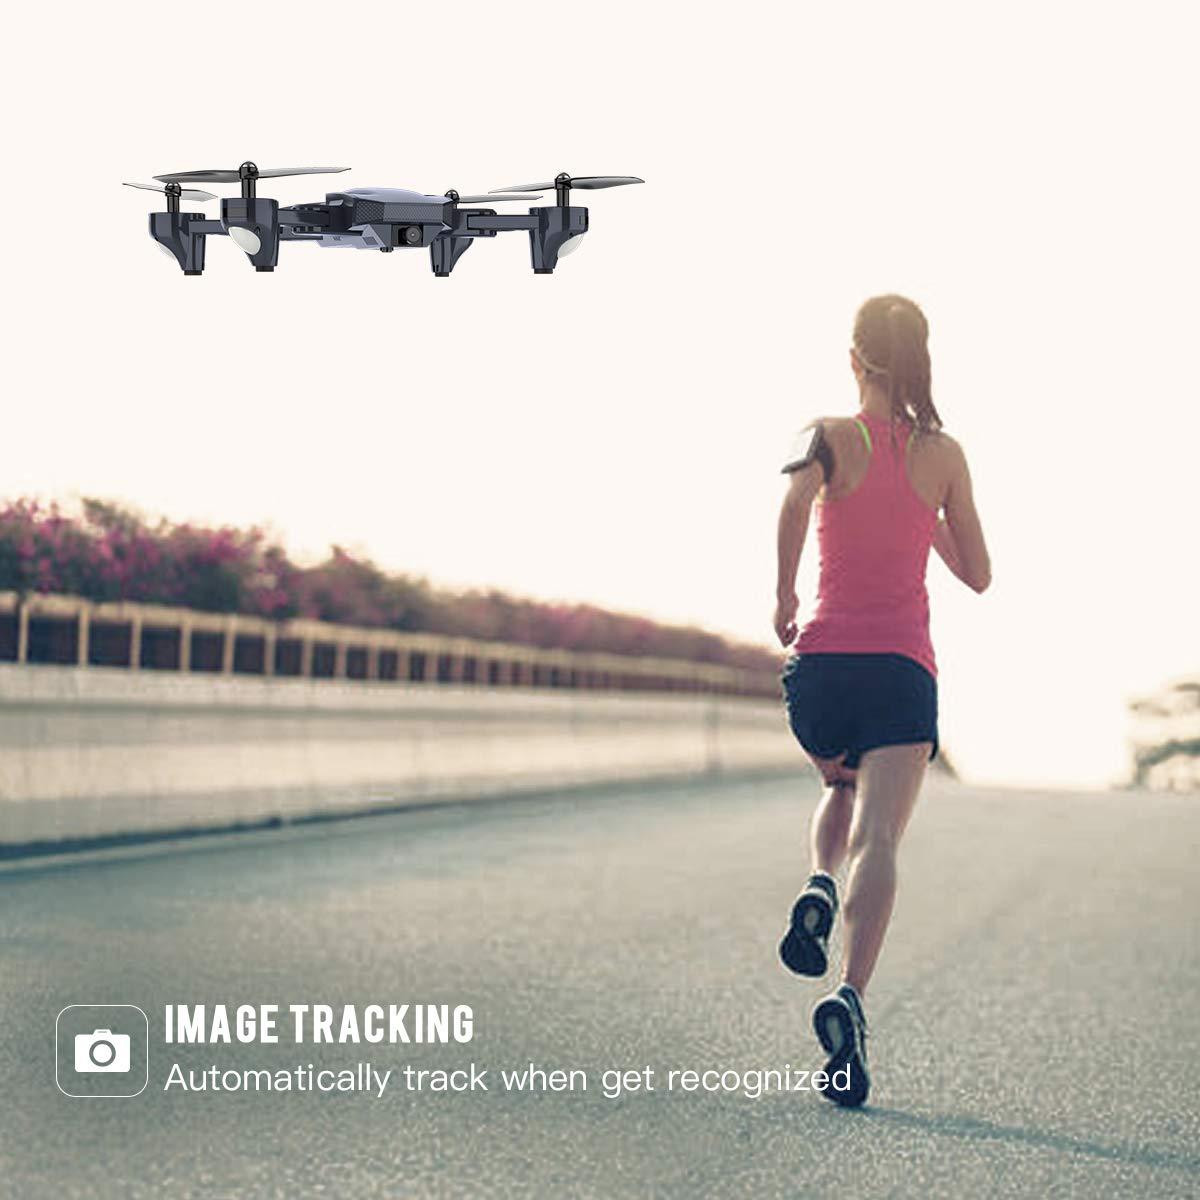 Supkiir Drone Image Tracking